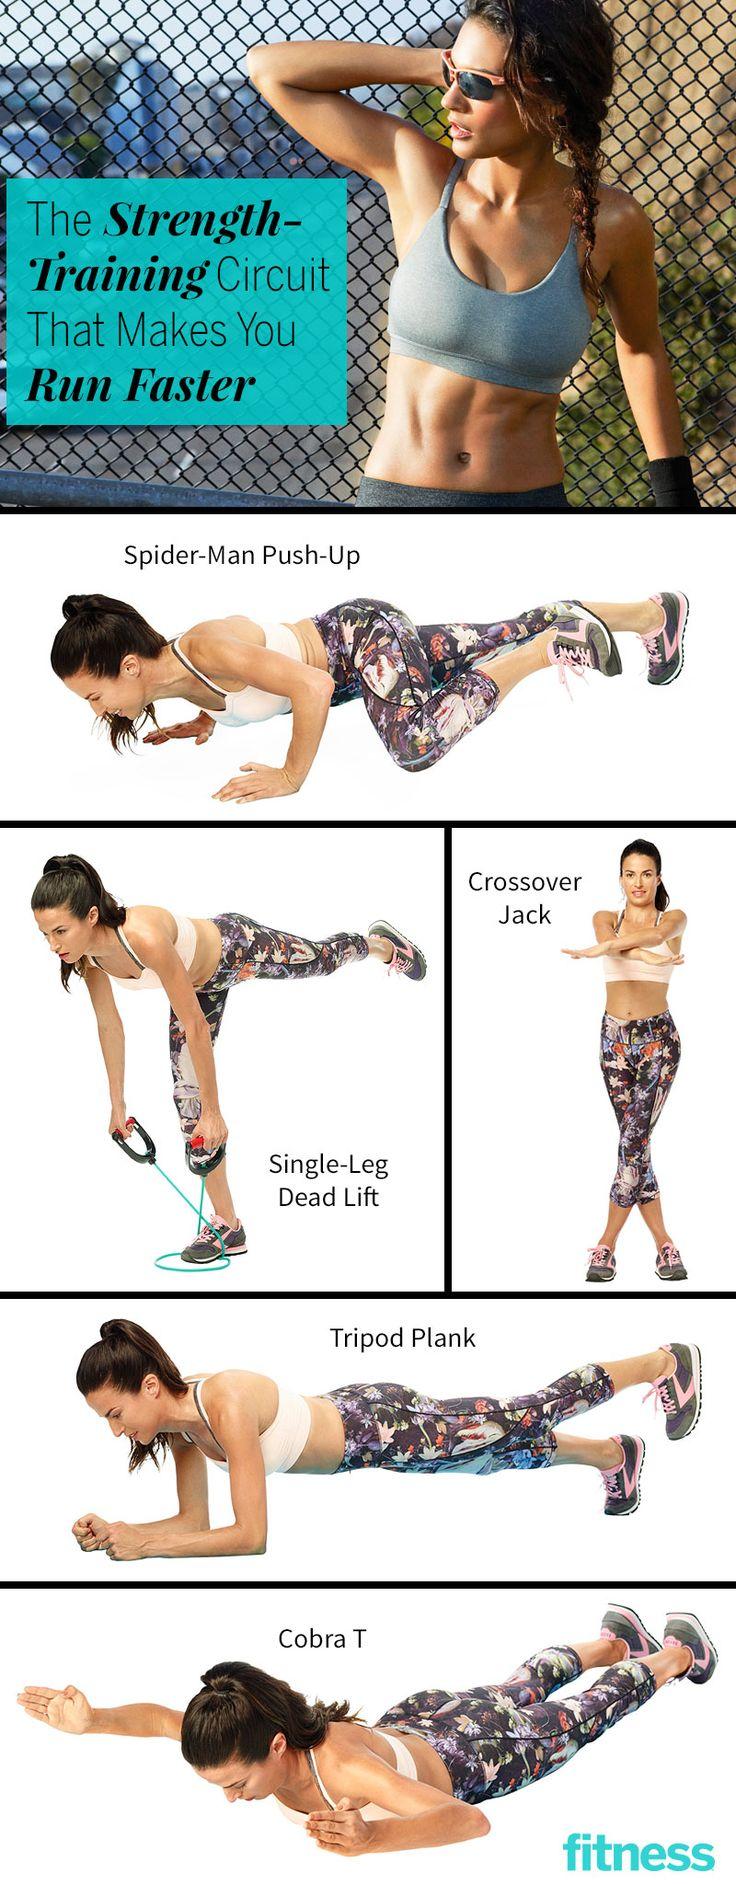 Cross-Training Exercises for Runners: Frogger Push-Up